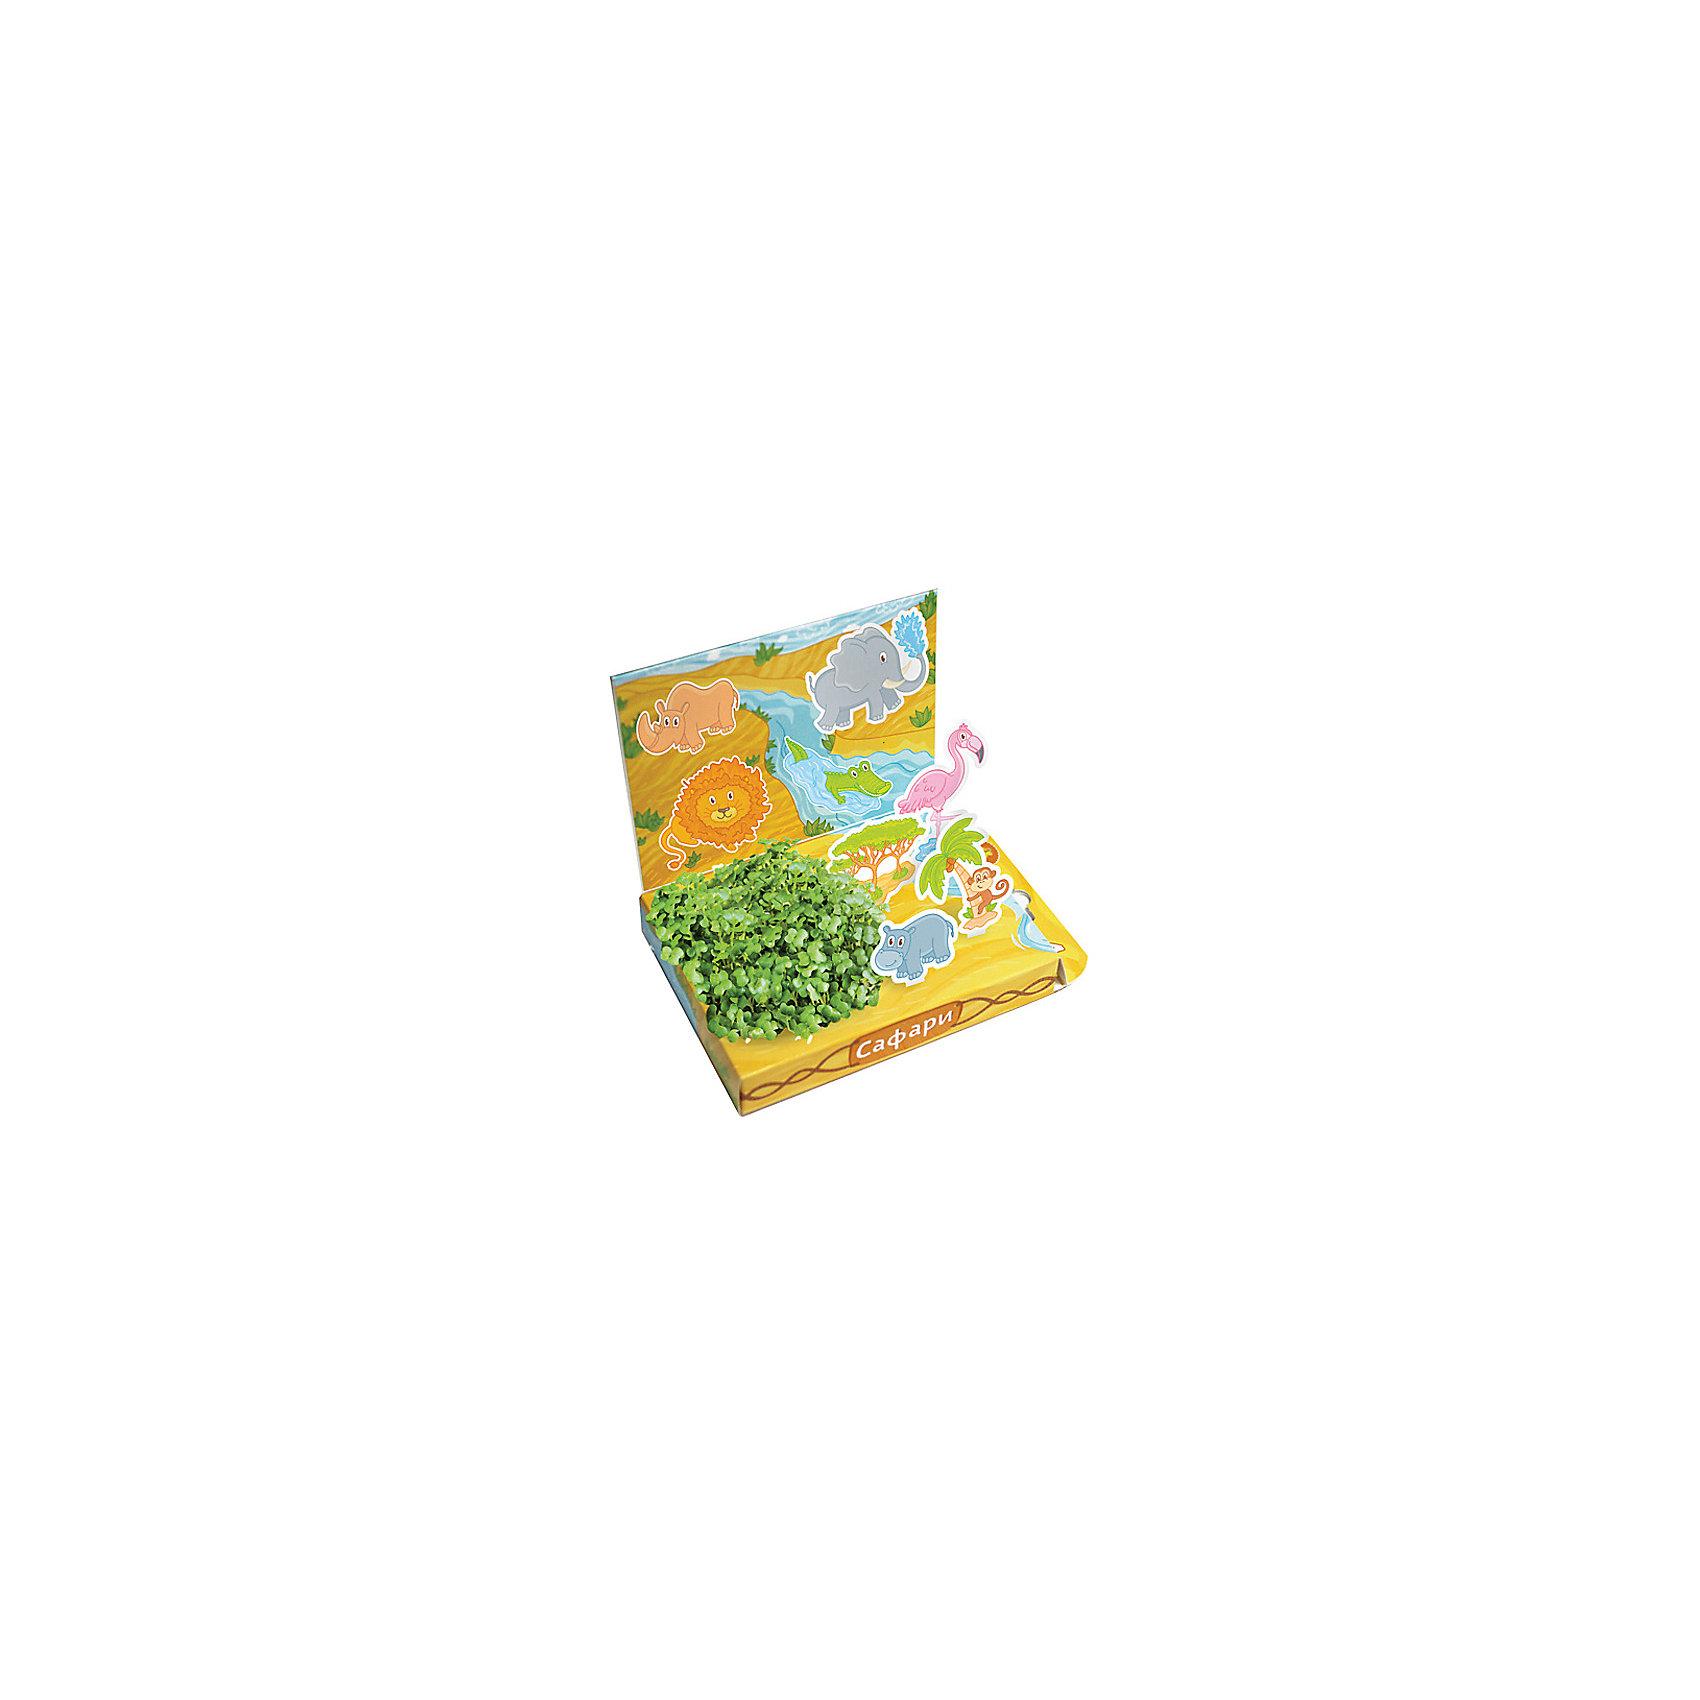 Бумбарам Набор для выращивания Сафари, Happy Plant набор для выращивания eco овечка 1040676